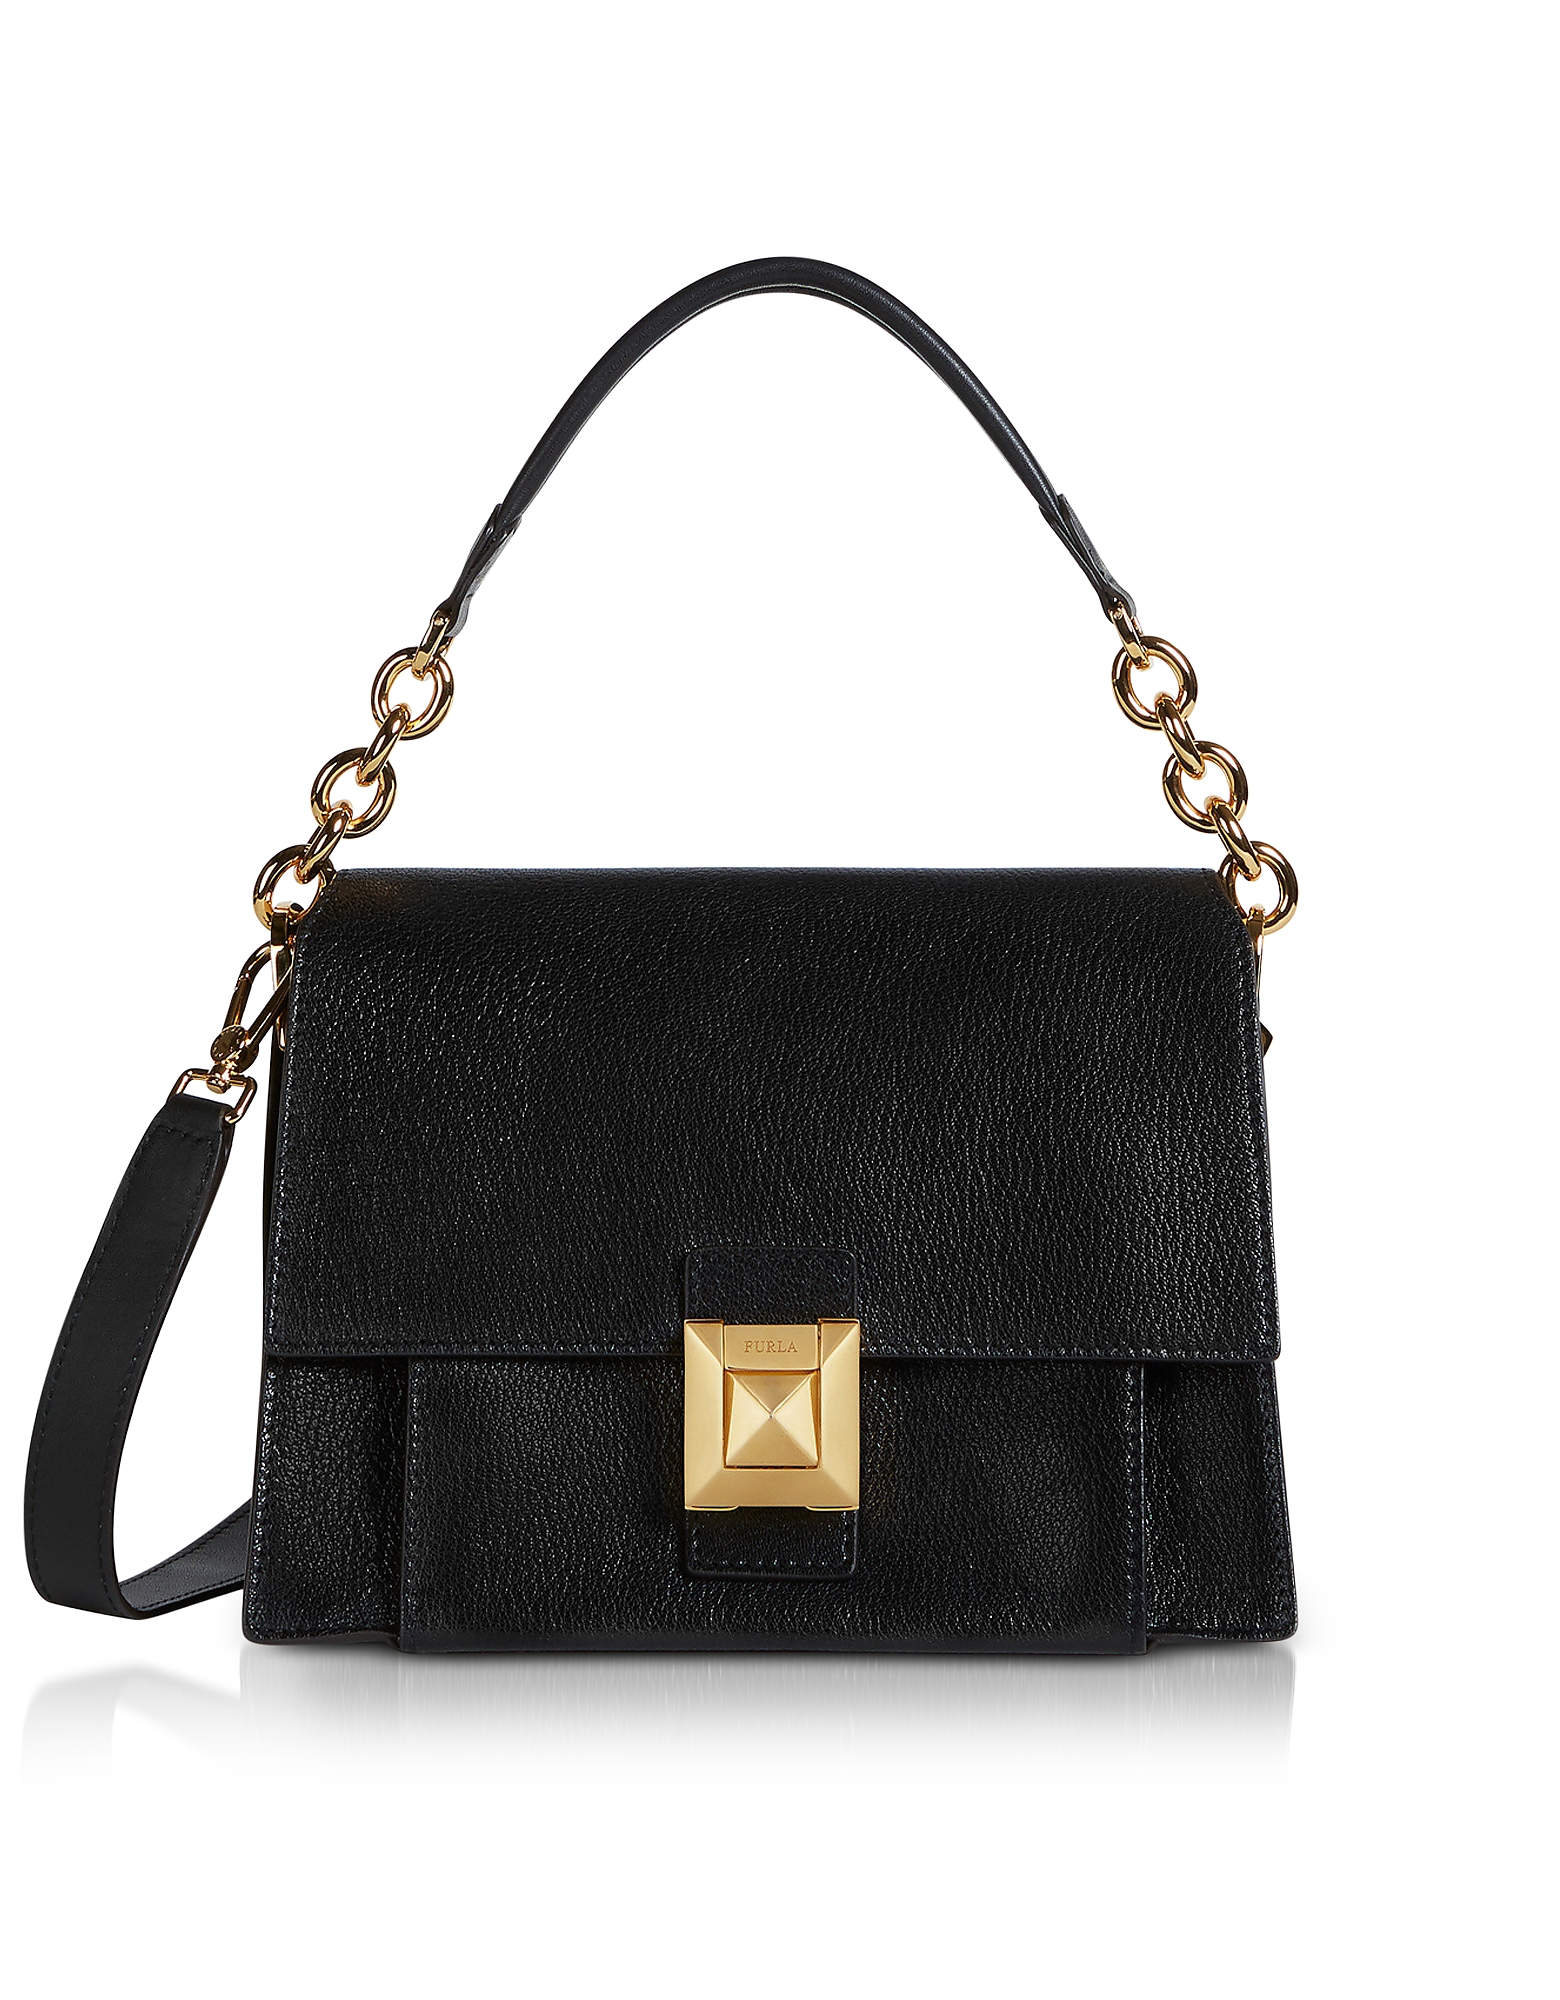 Furla Designer Handbags, Diva S Shoulder Bag